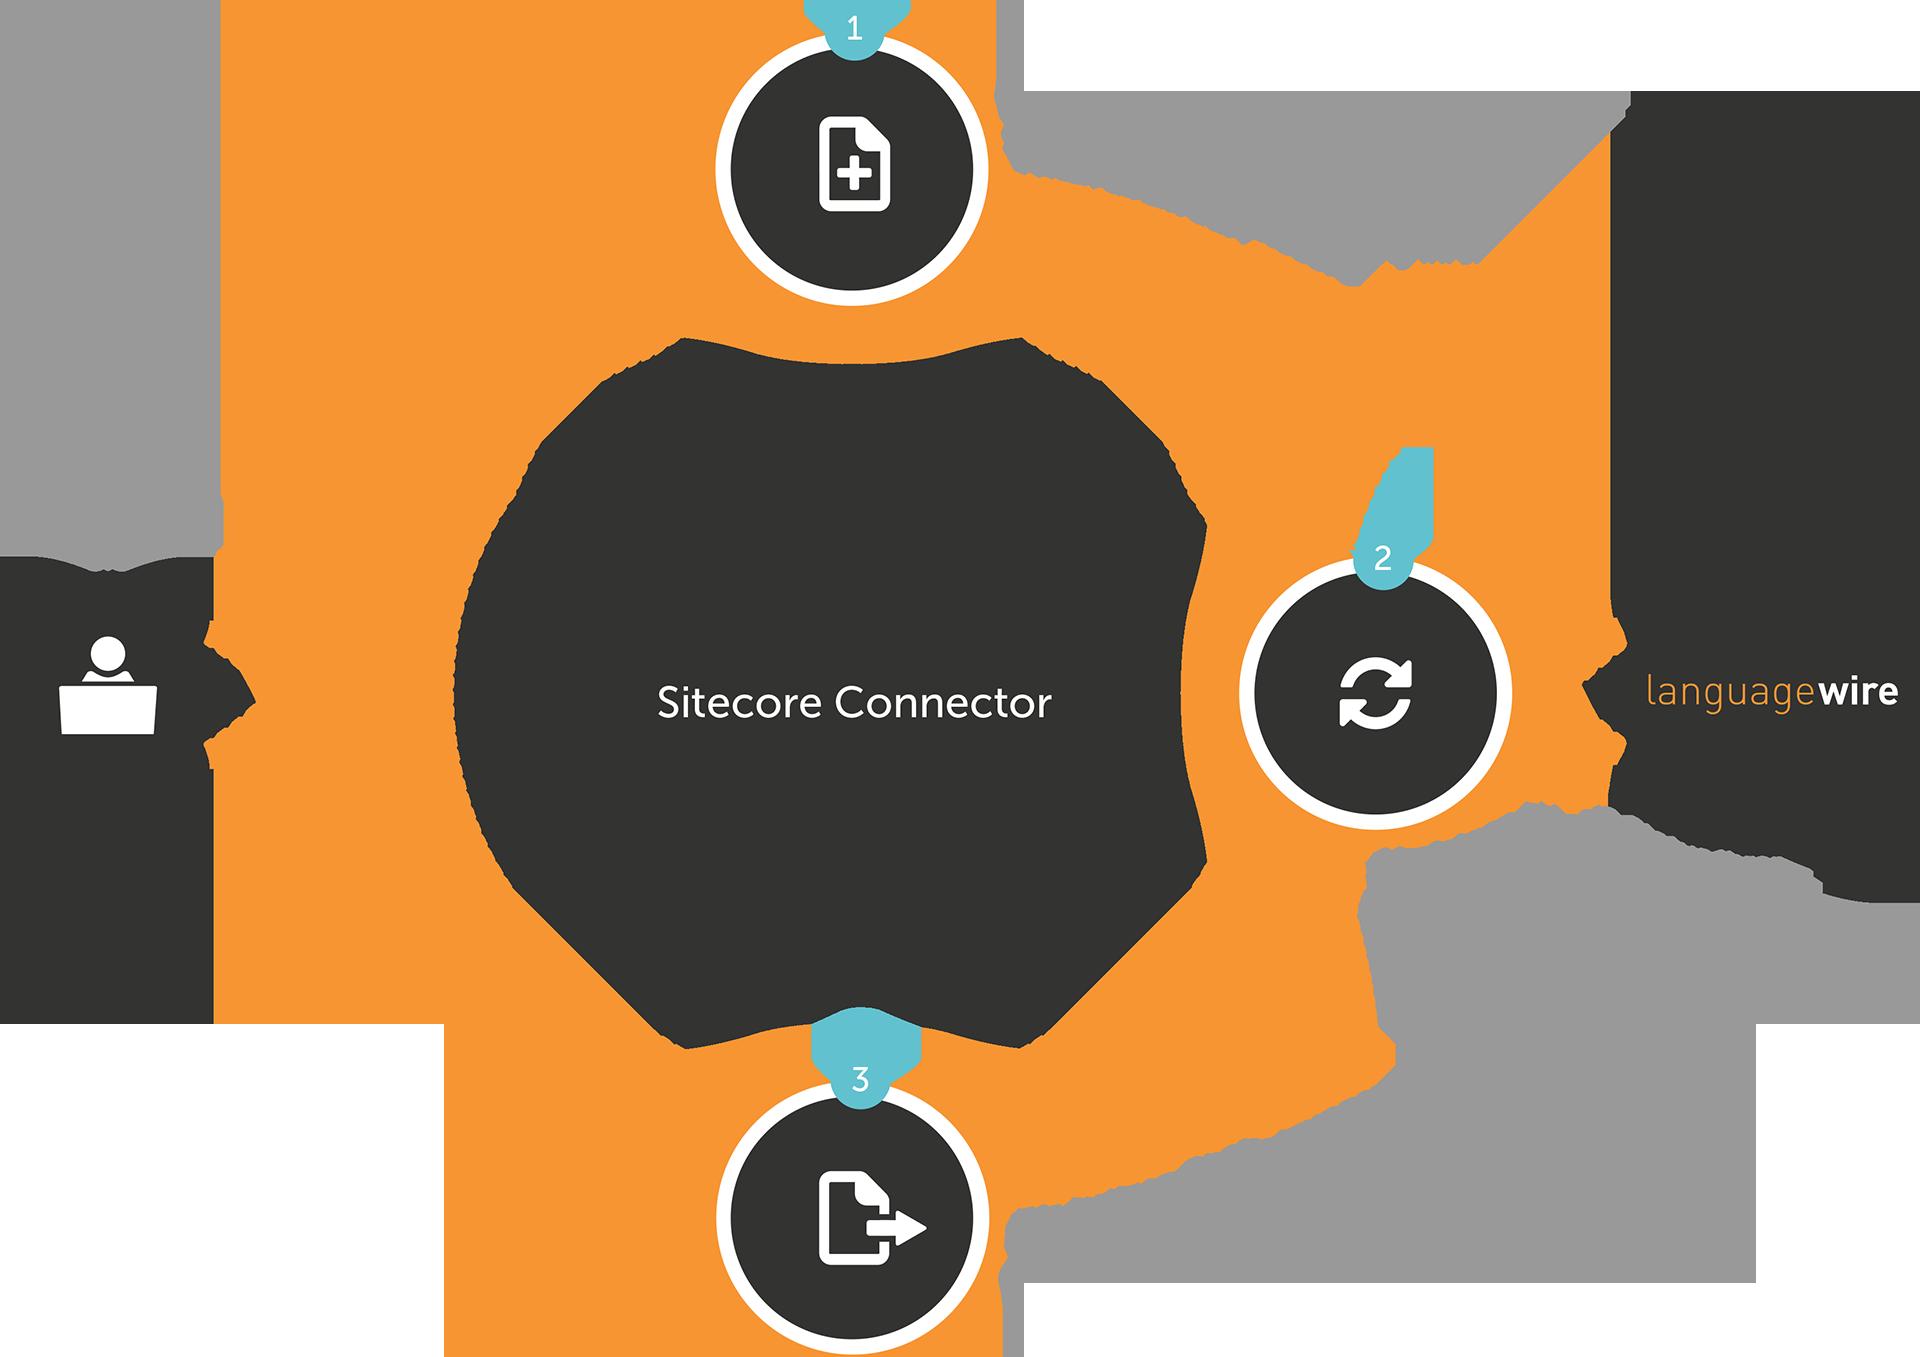 Sitecore Connector